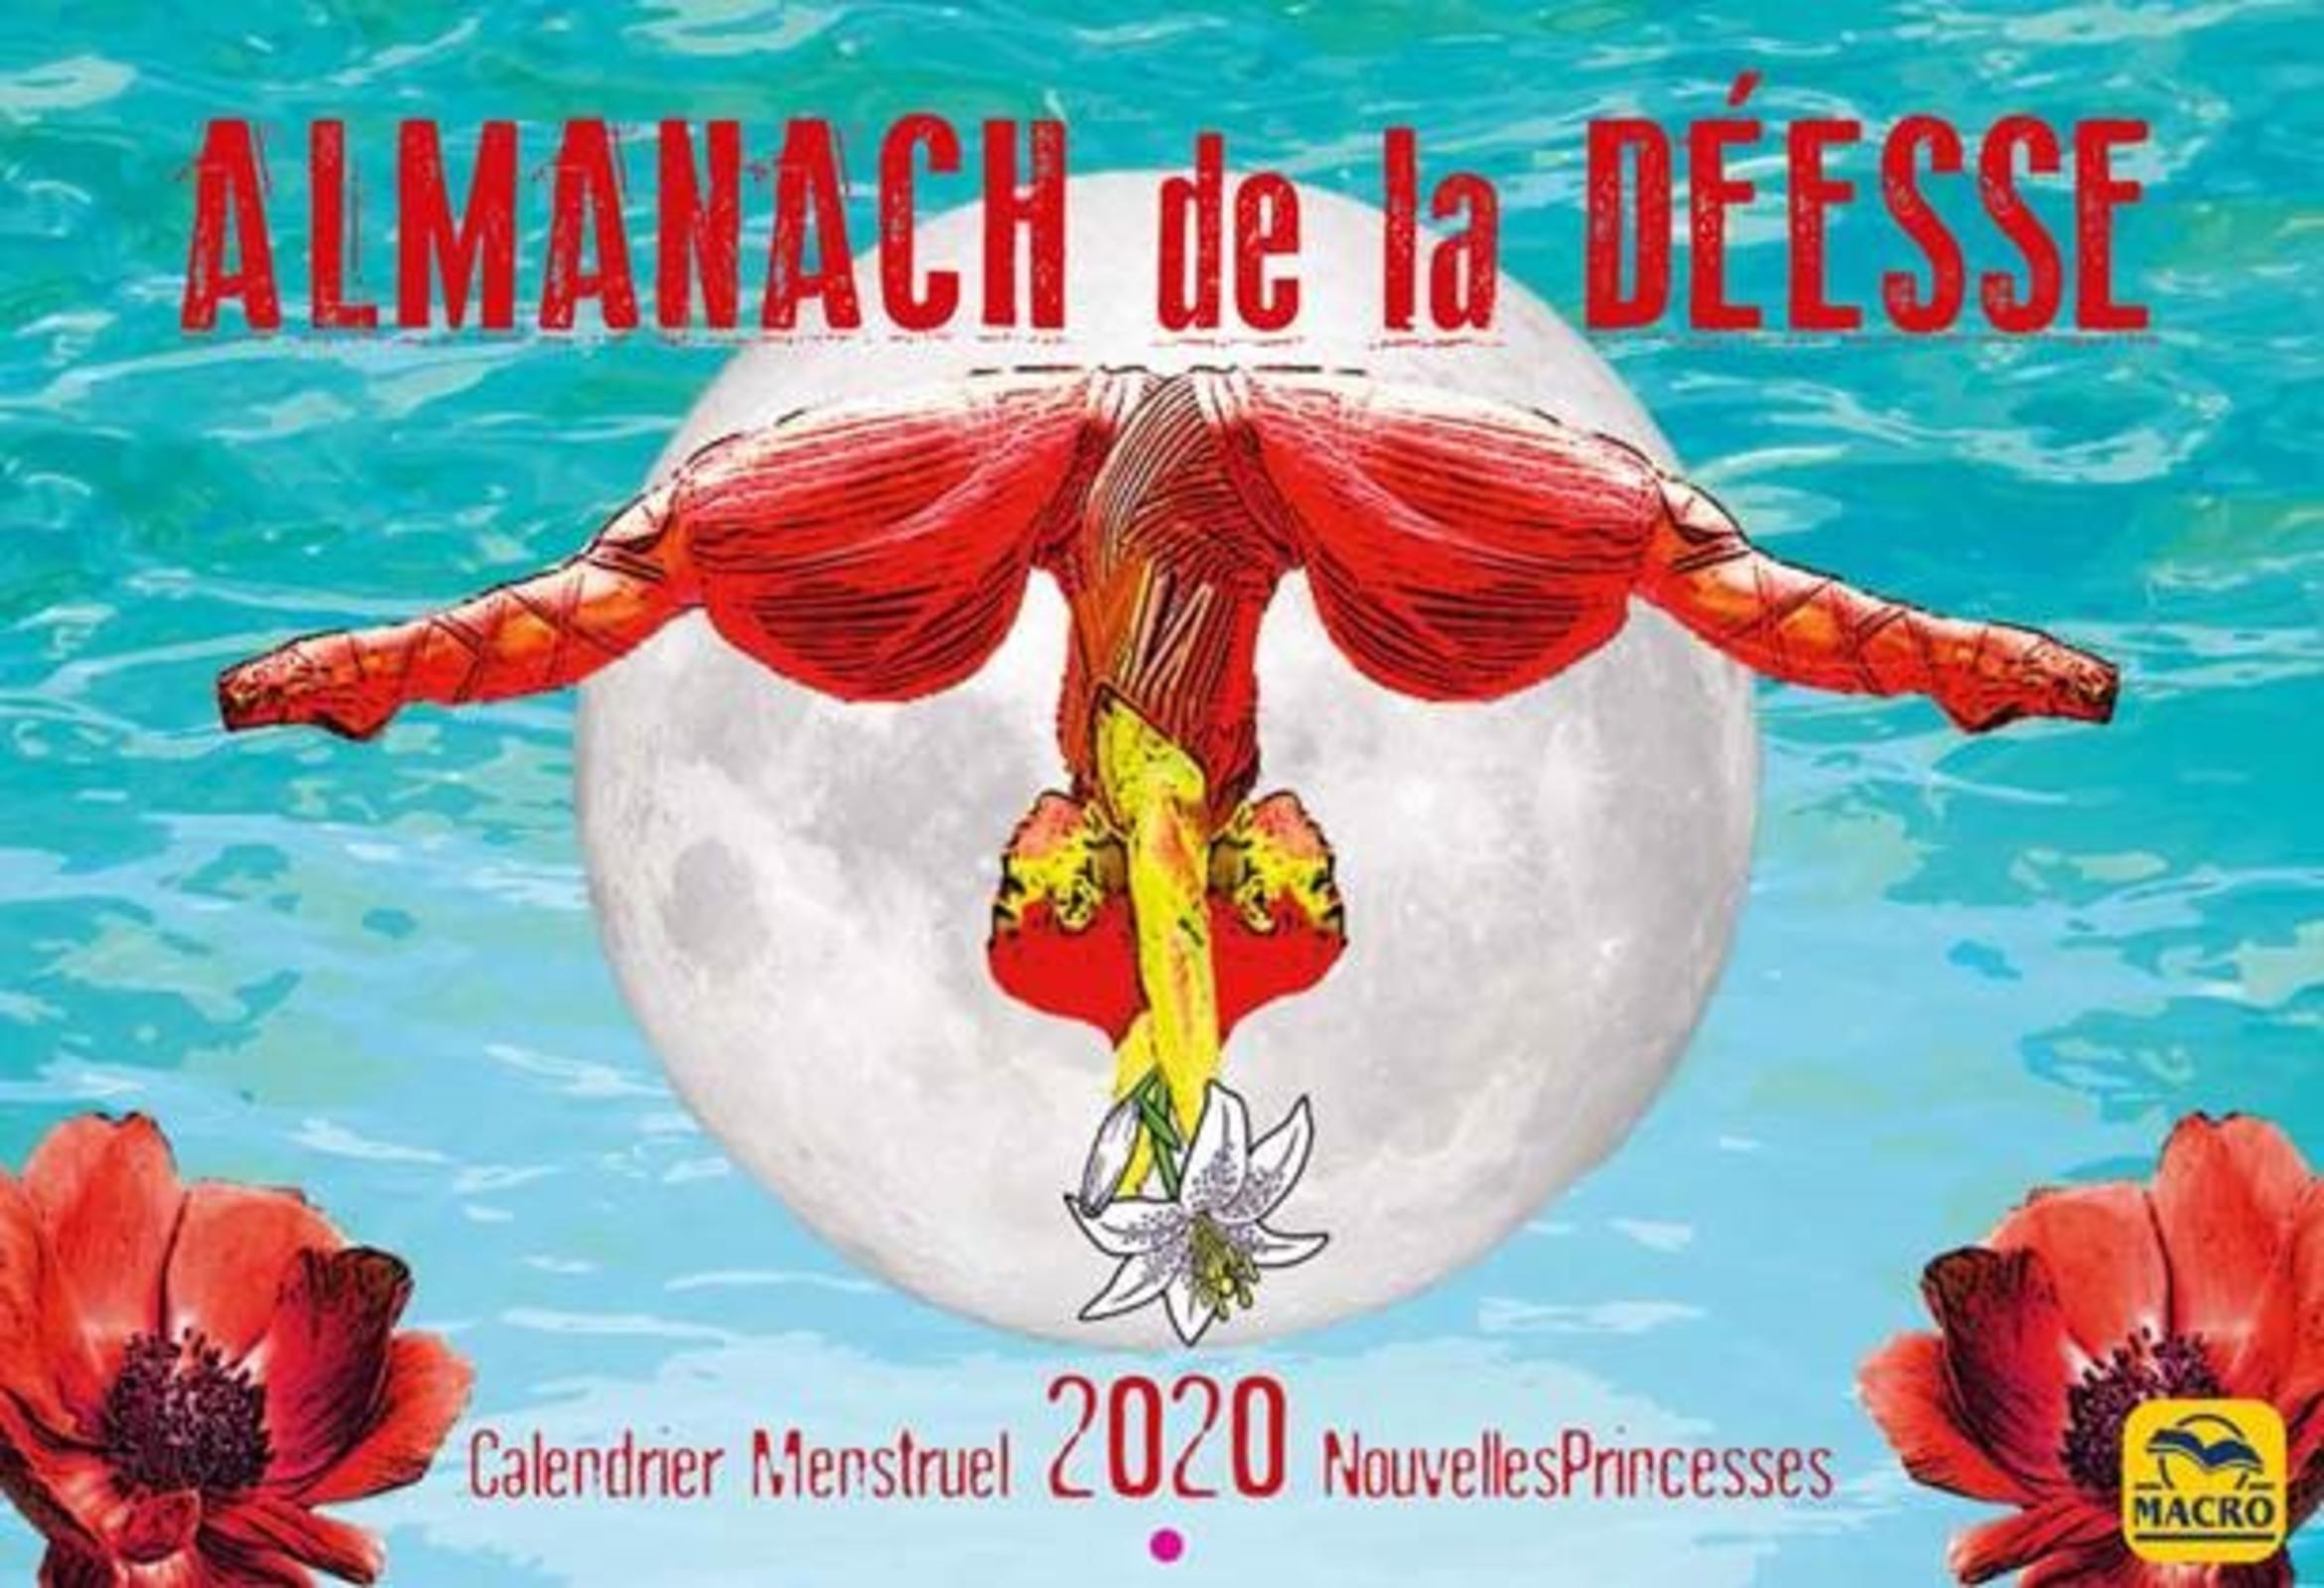 ALMANACH DE LA DEESSE - CALENDRIER MESTRUEL 2020  NOUVELLES PRINCESSES